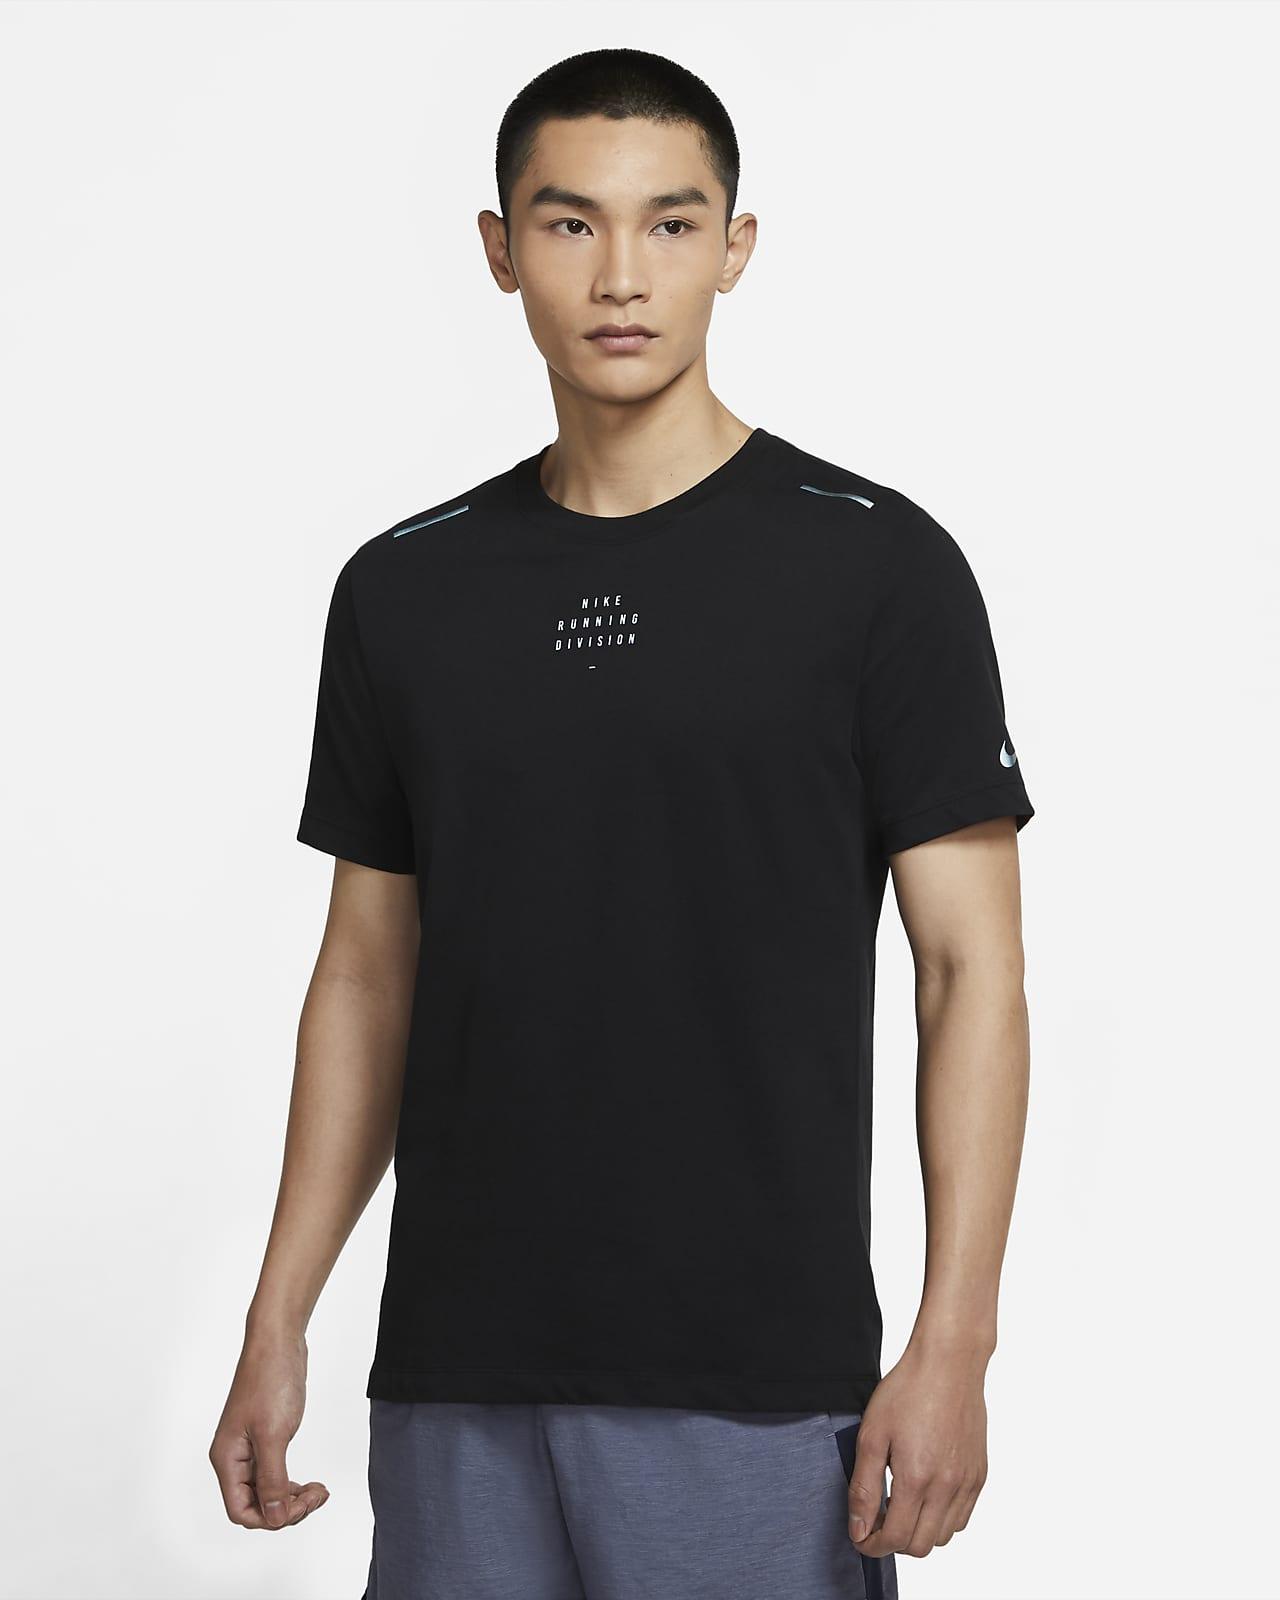 Nike Sportswear 男子短袖跑步上衣